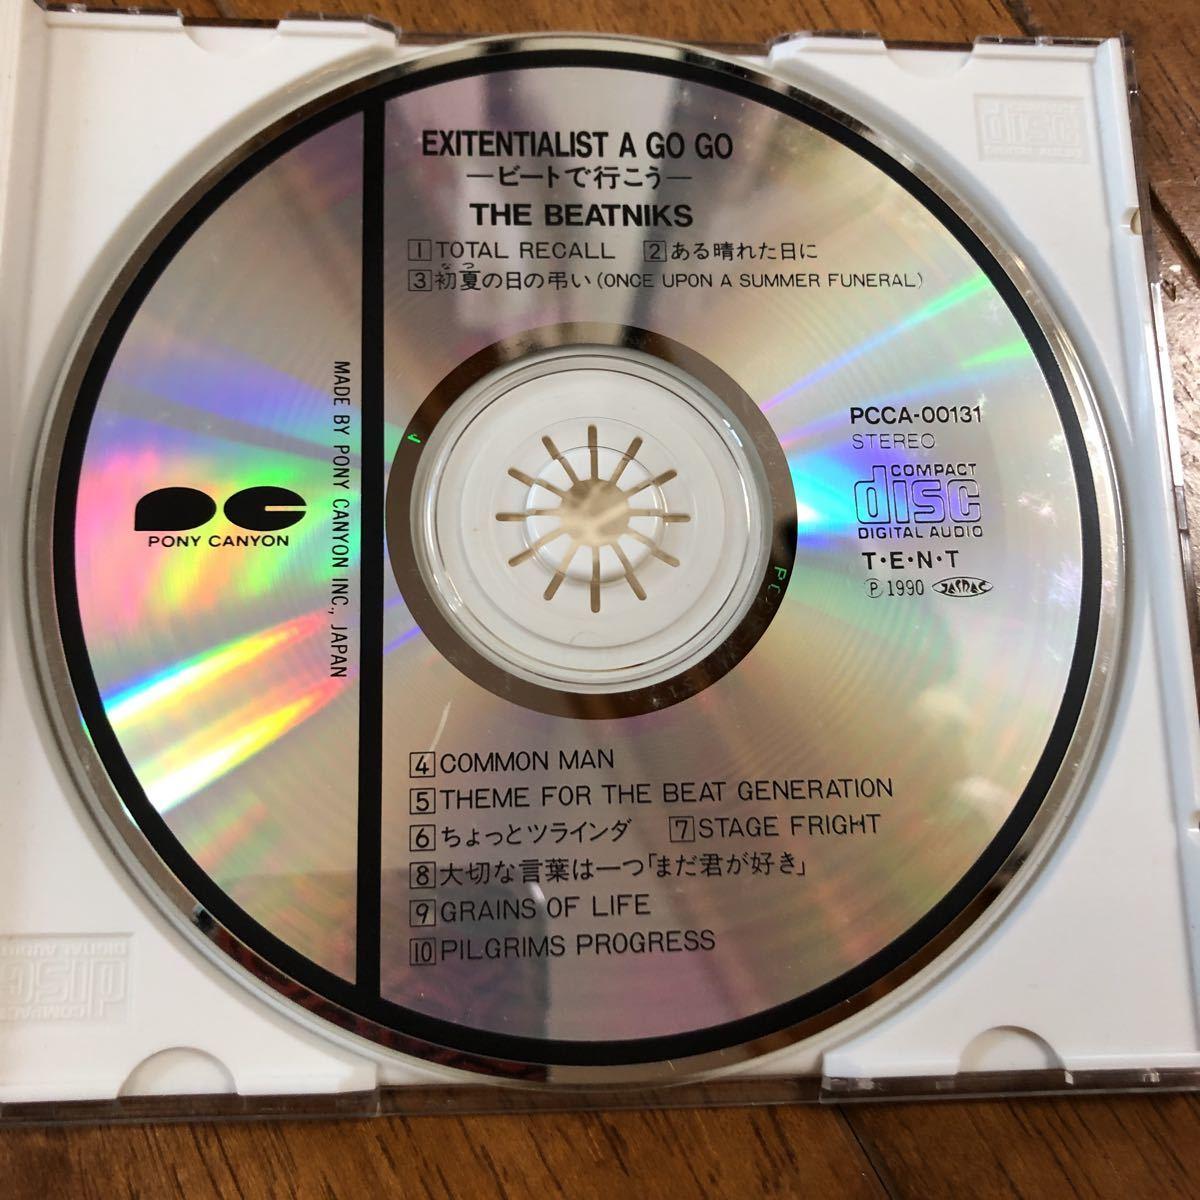 THE BEATNIKS ザ・ビートニクス(高橋幸宏/鈴木慶一)  EXITENTIALIST A GO GO  ビートで行こう_画像2